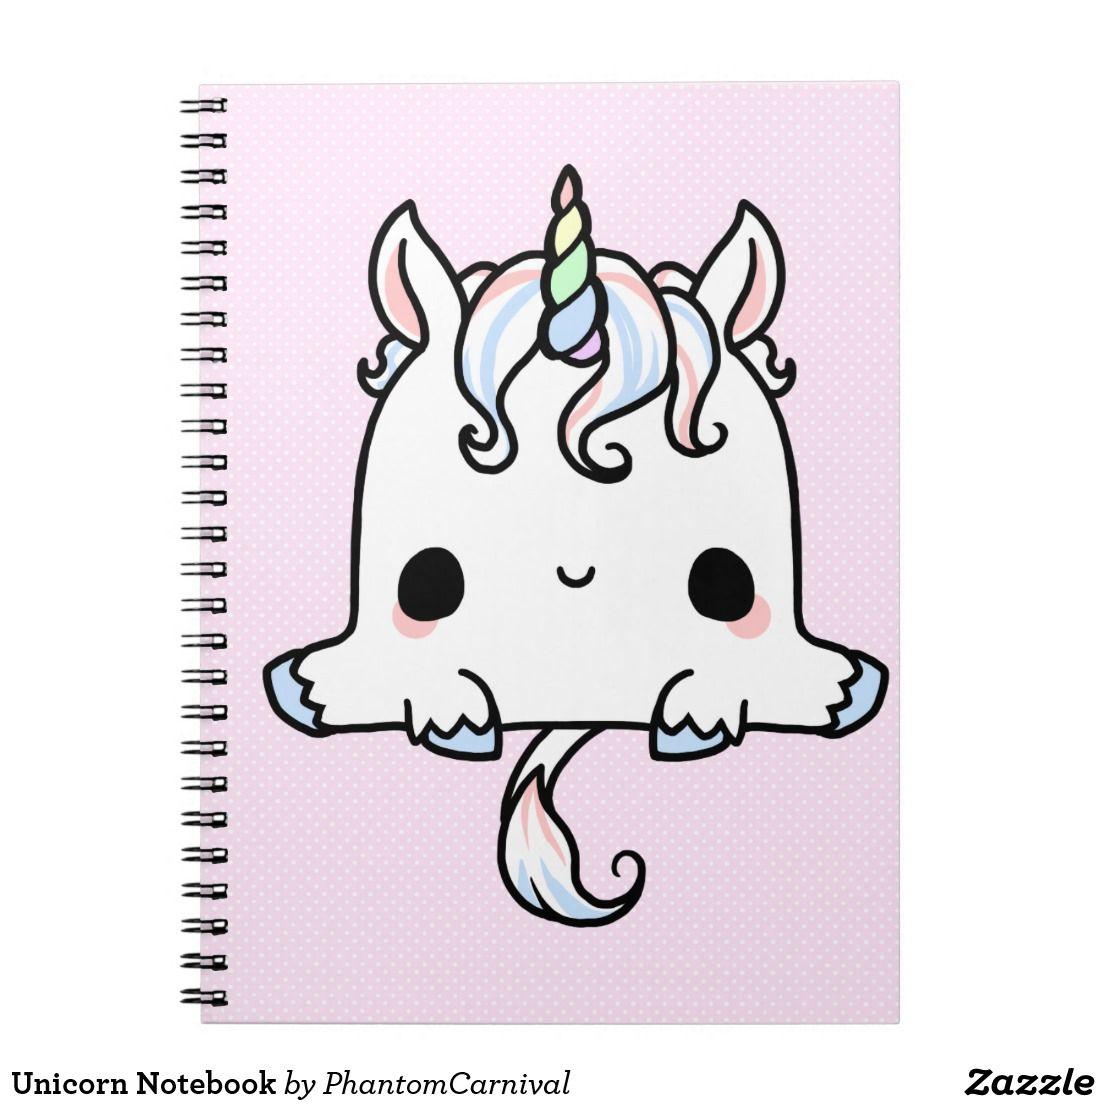 Unicorn Notebook Zazzle Com Kawaii Unicorn Kawaii Notebook